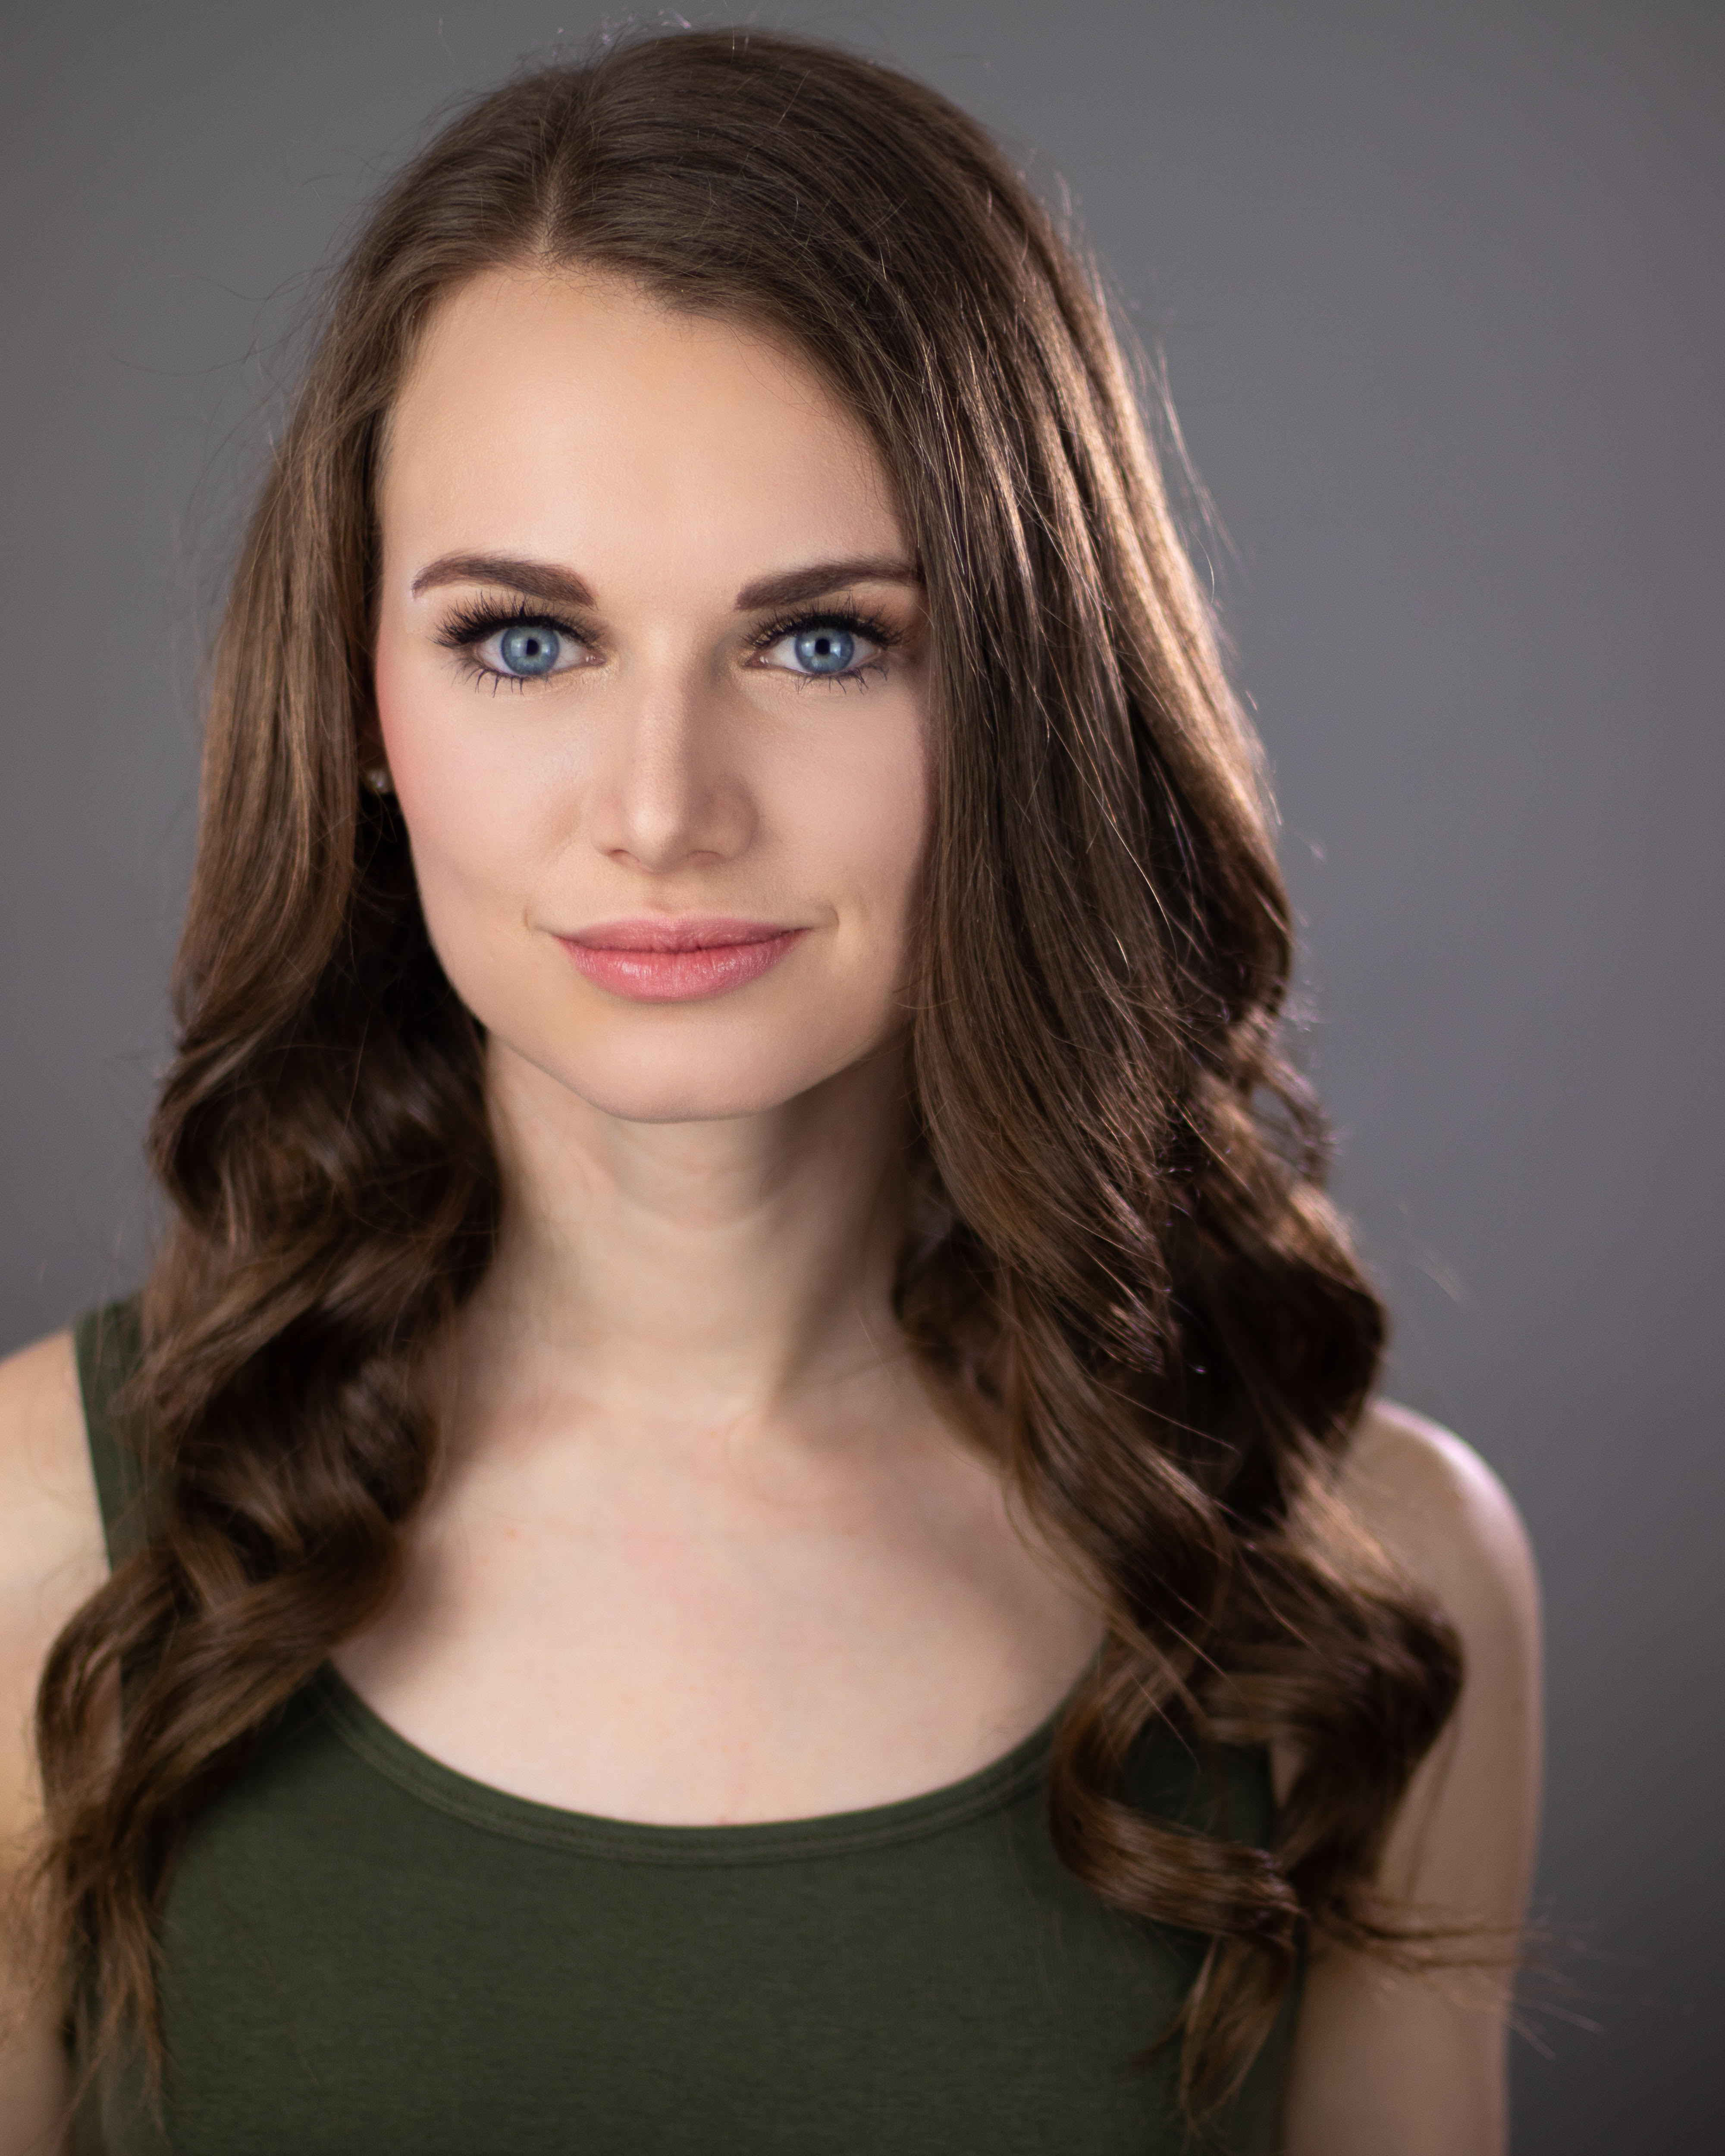 Kathryn Detweiler - Leggs